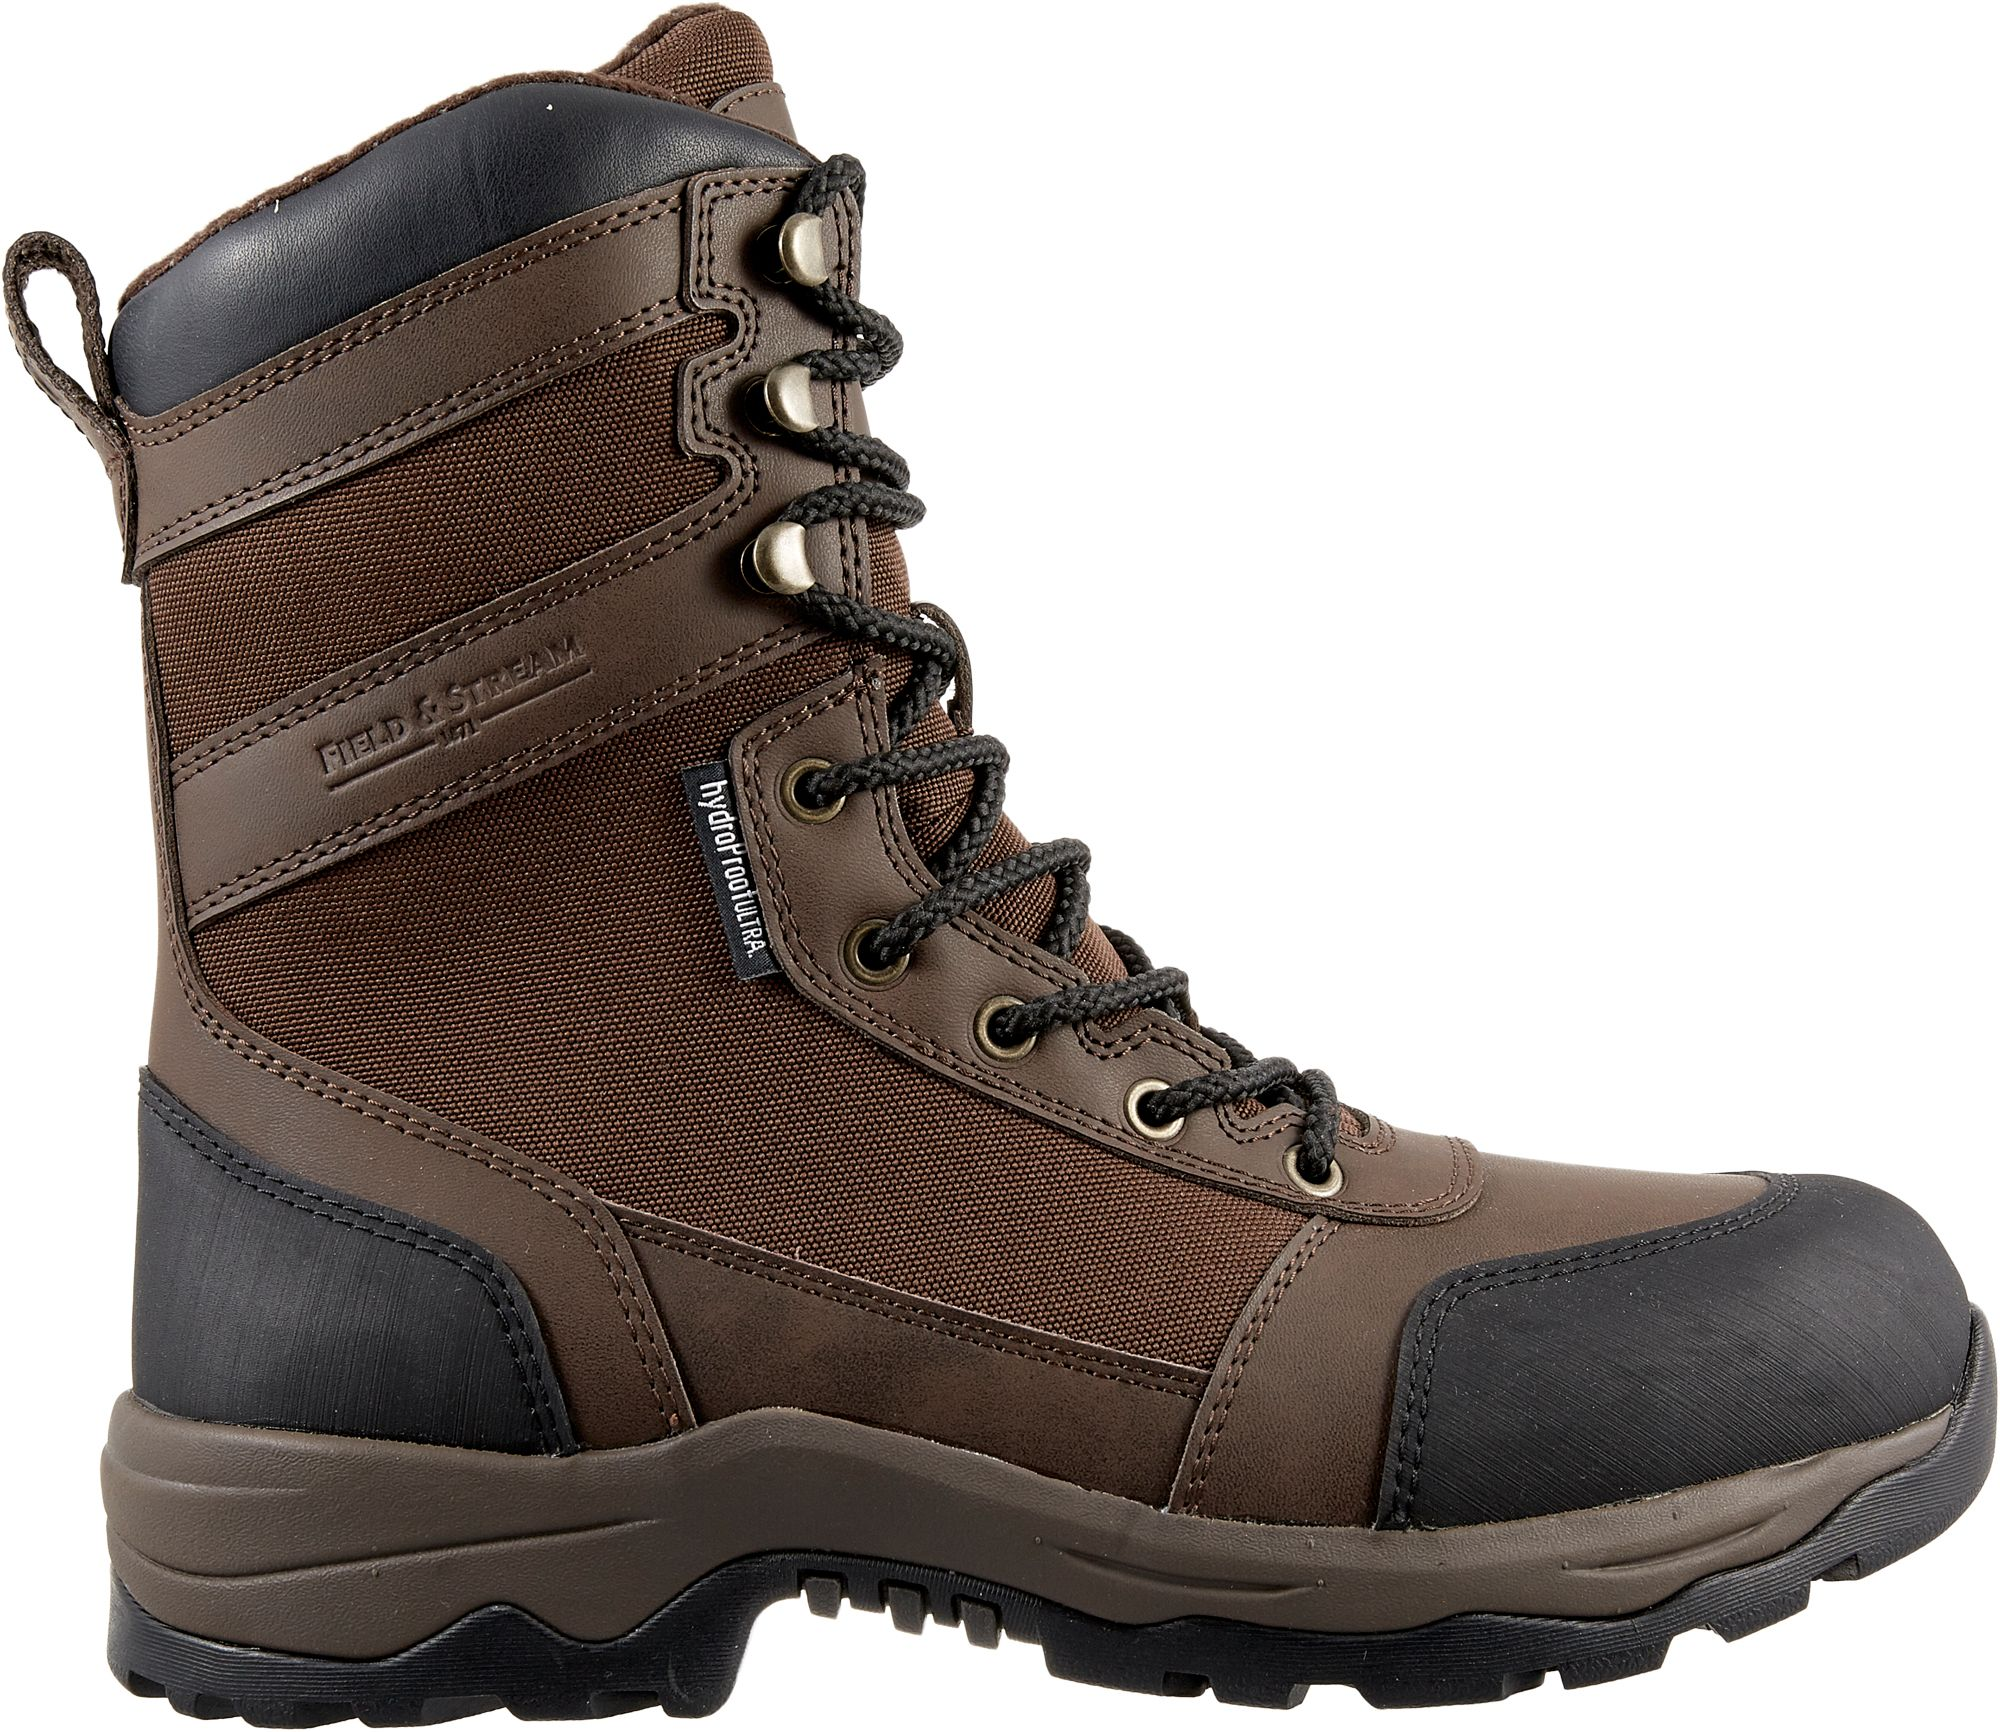 Men's Woodland Tracker 400g Waterproof Field Hunting Boots